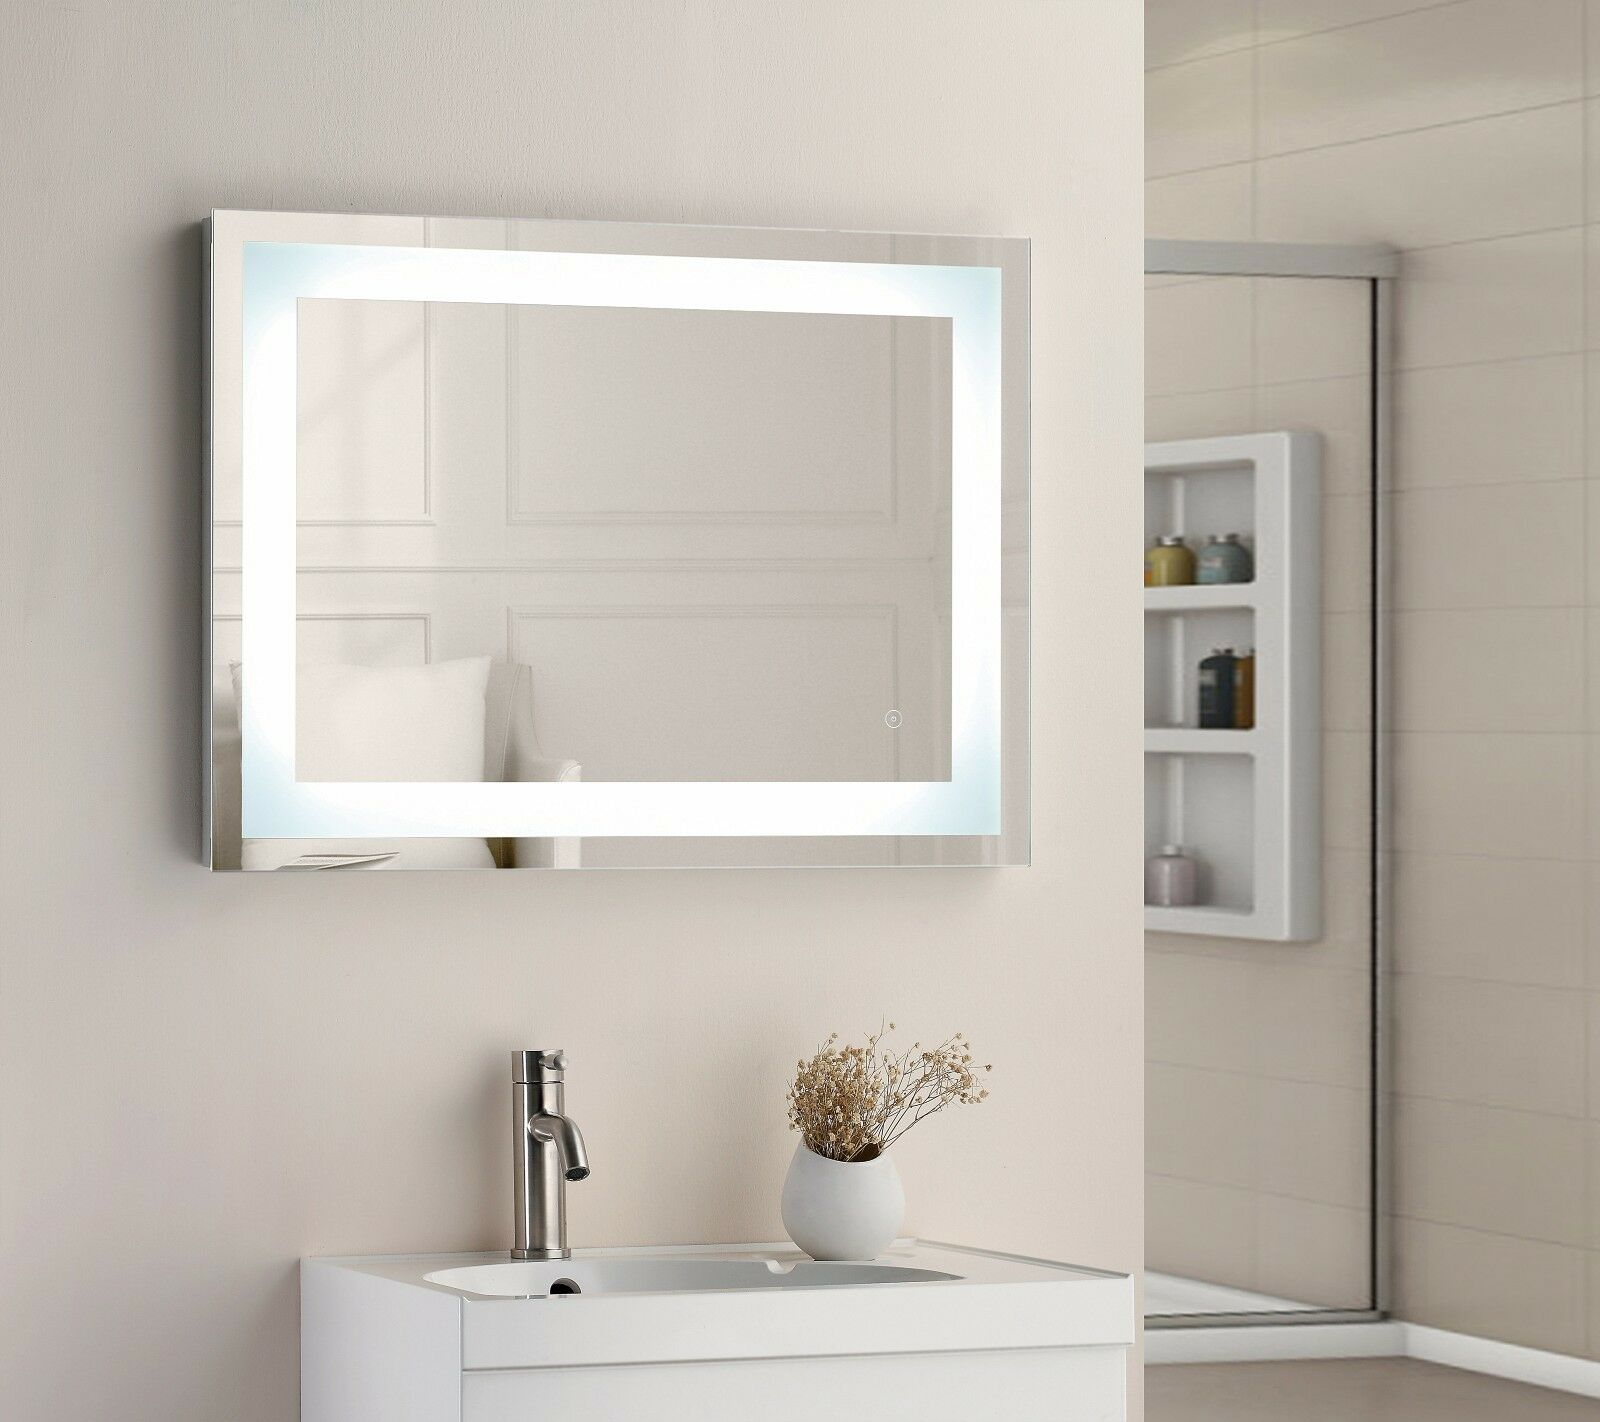 800 X 600 mm Cuadrada Iluminado Led Touch Espejo de baño Desempañador IP44